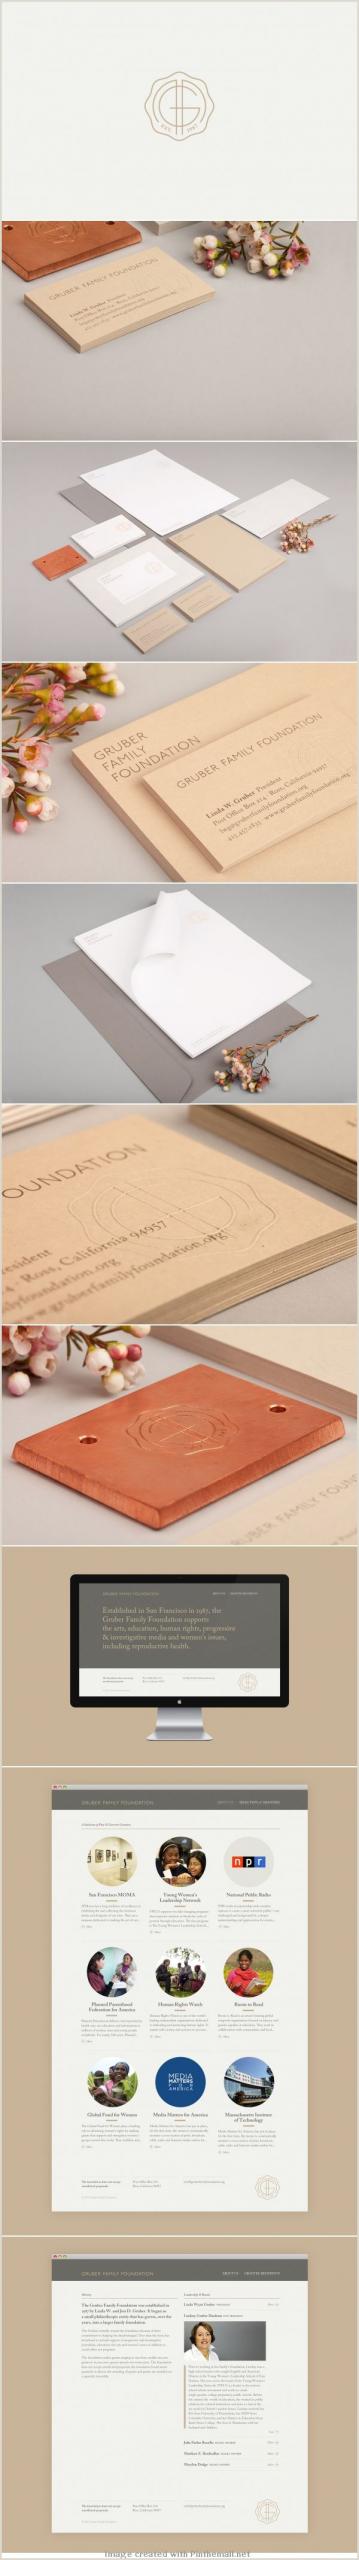 Business Cards Pinterest 14 Popular Hardwood Flooring Business Card Template